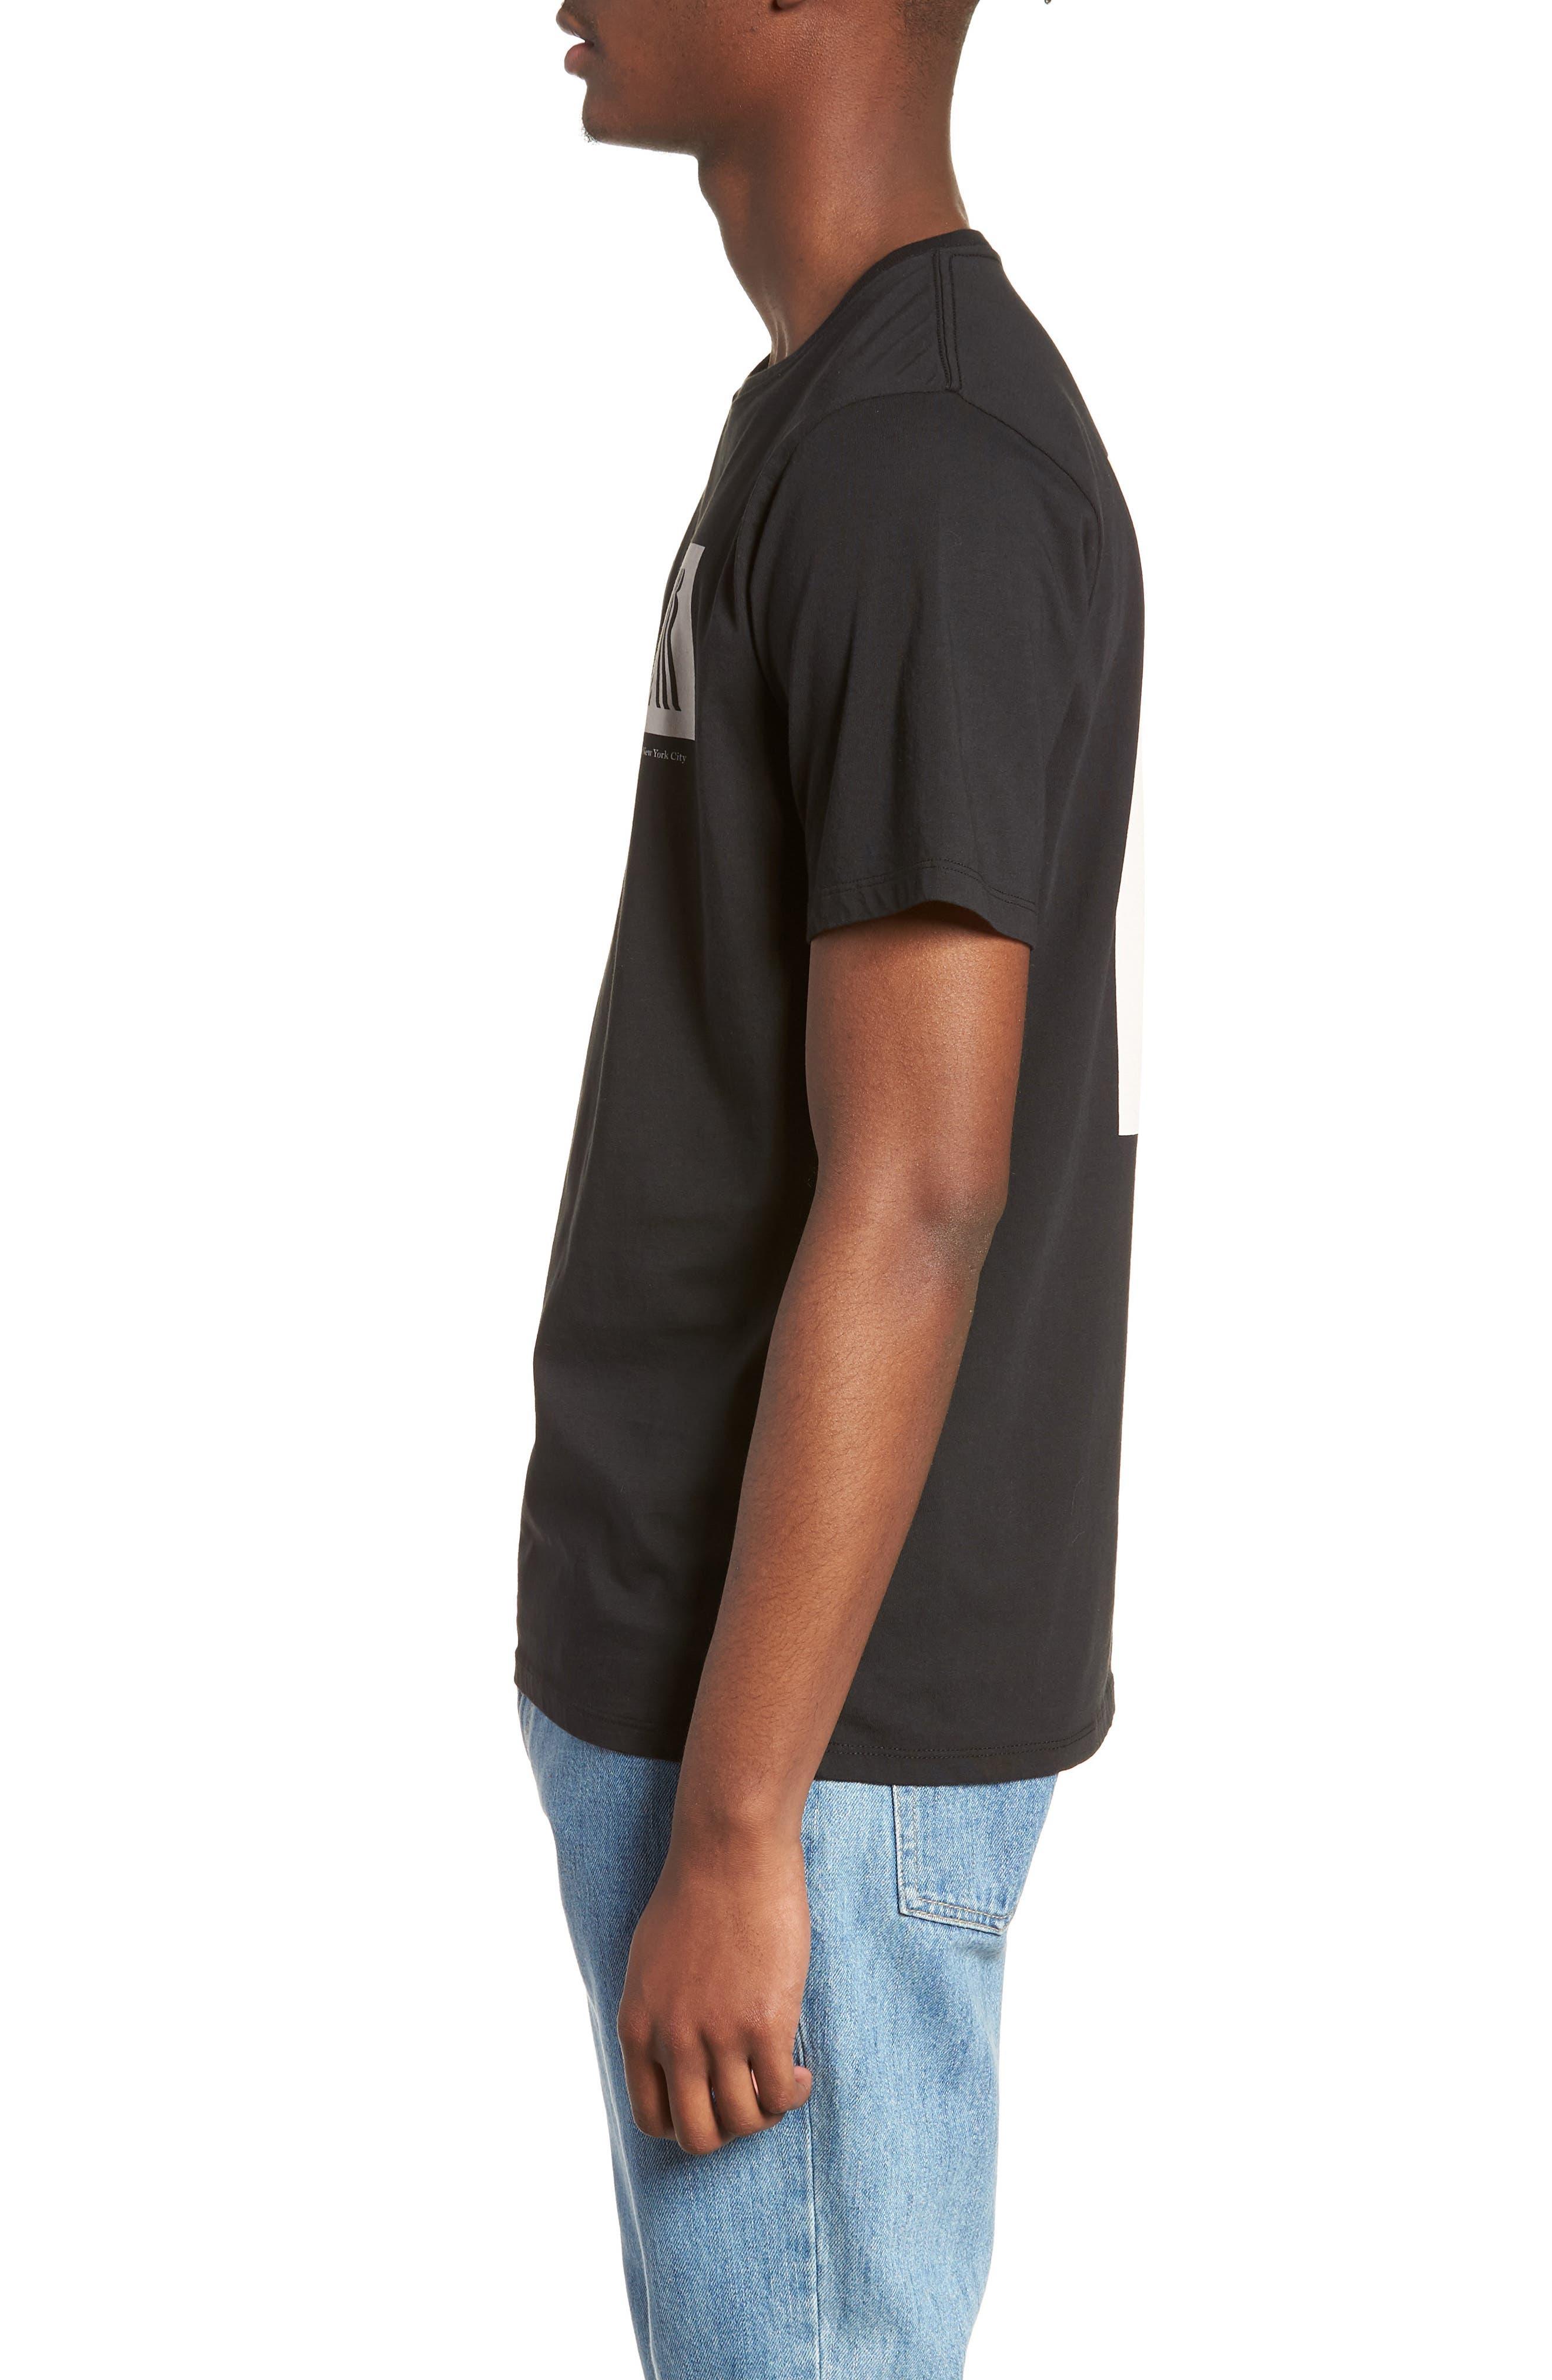 Walking Man T-Shirt,                             Alternate thumbnail 3, color,                             BLACK